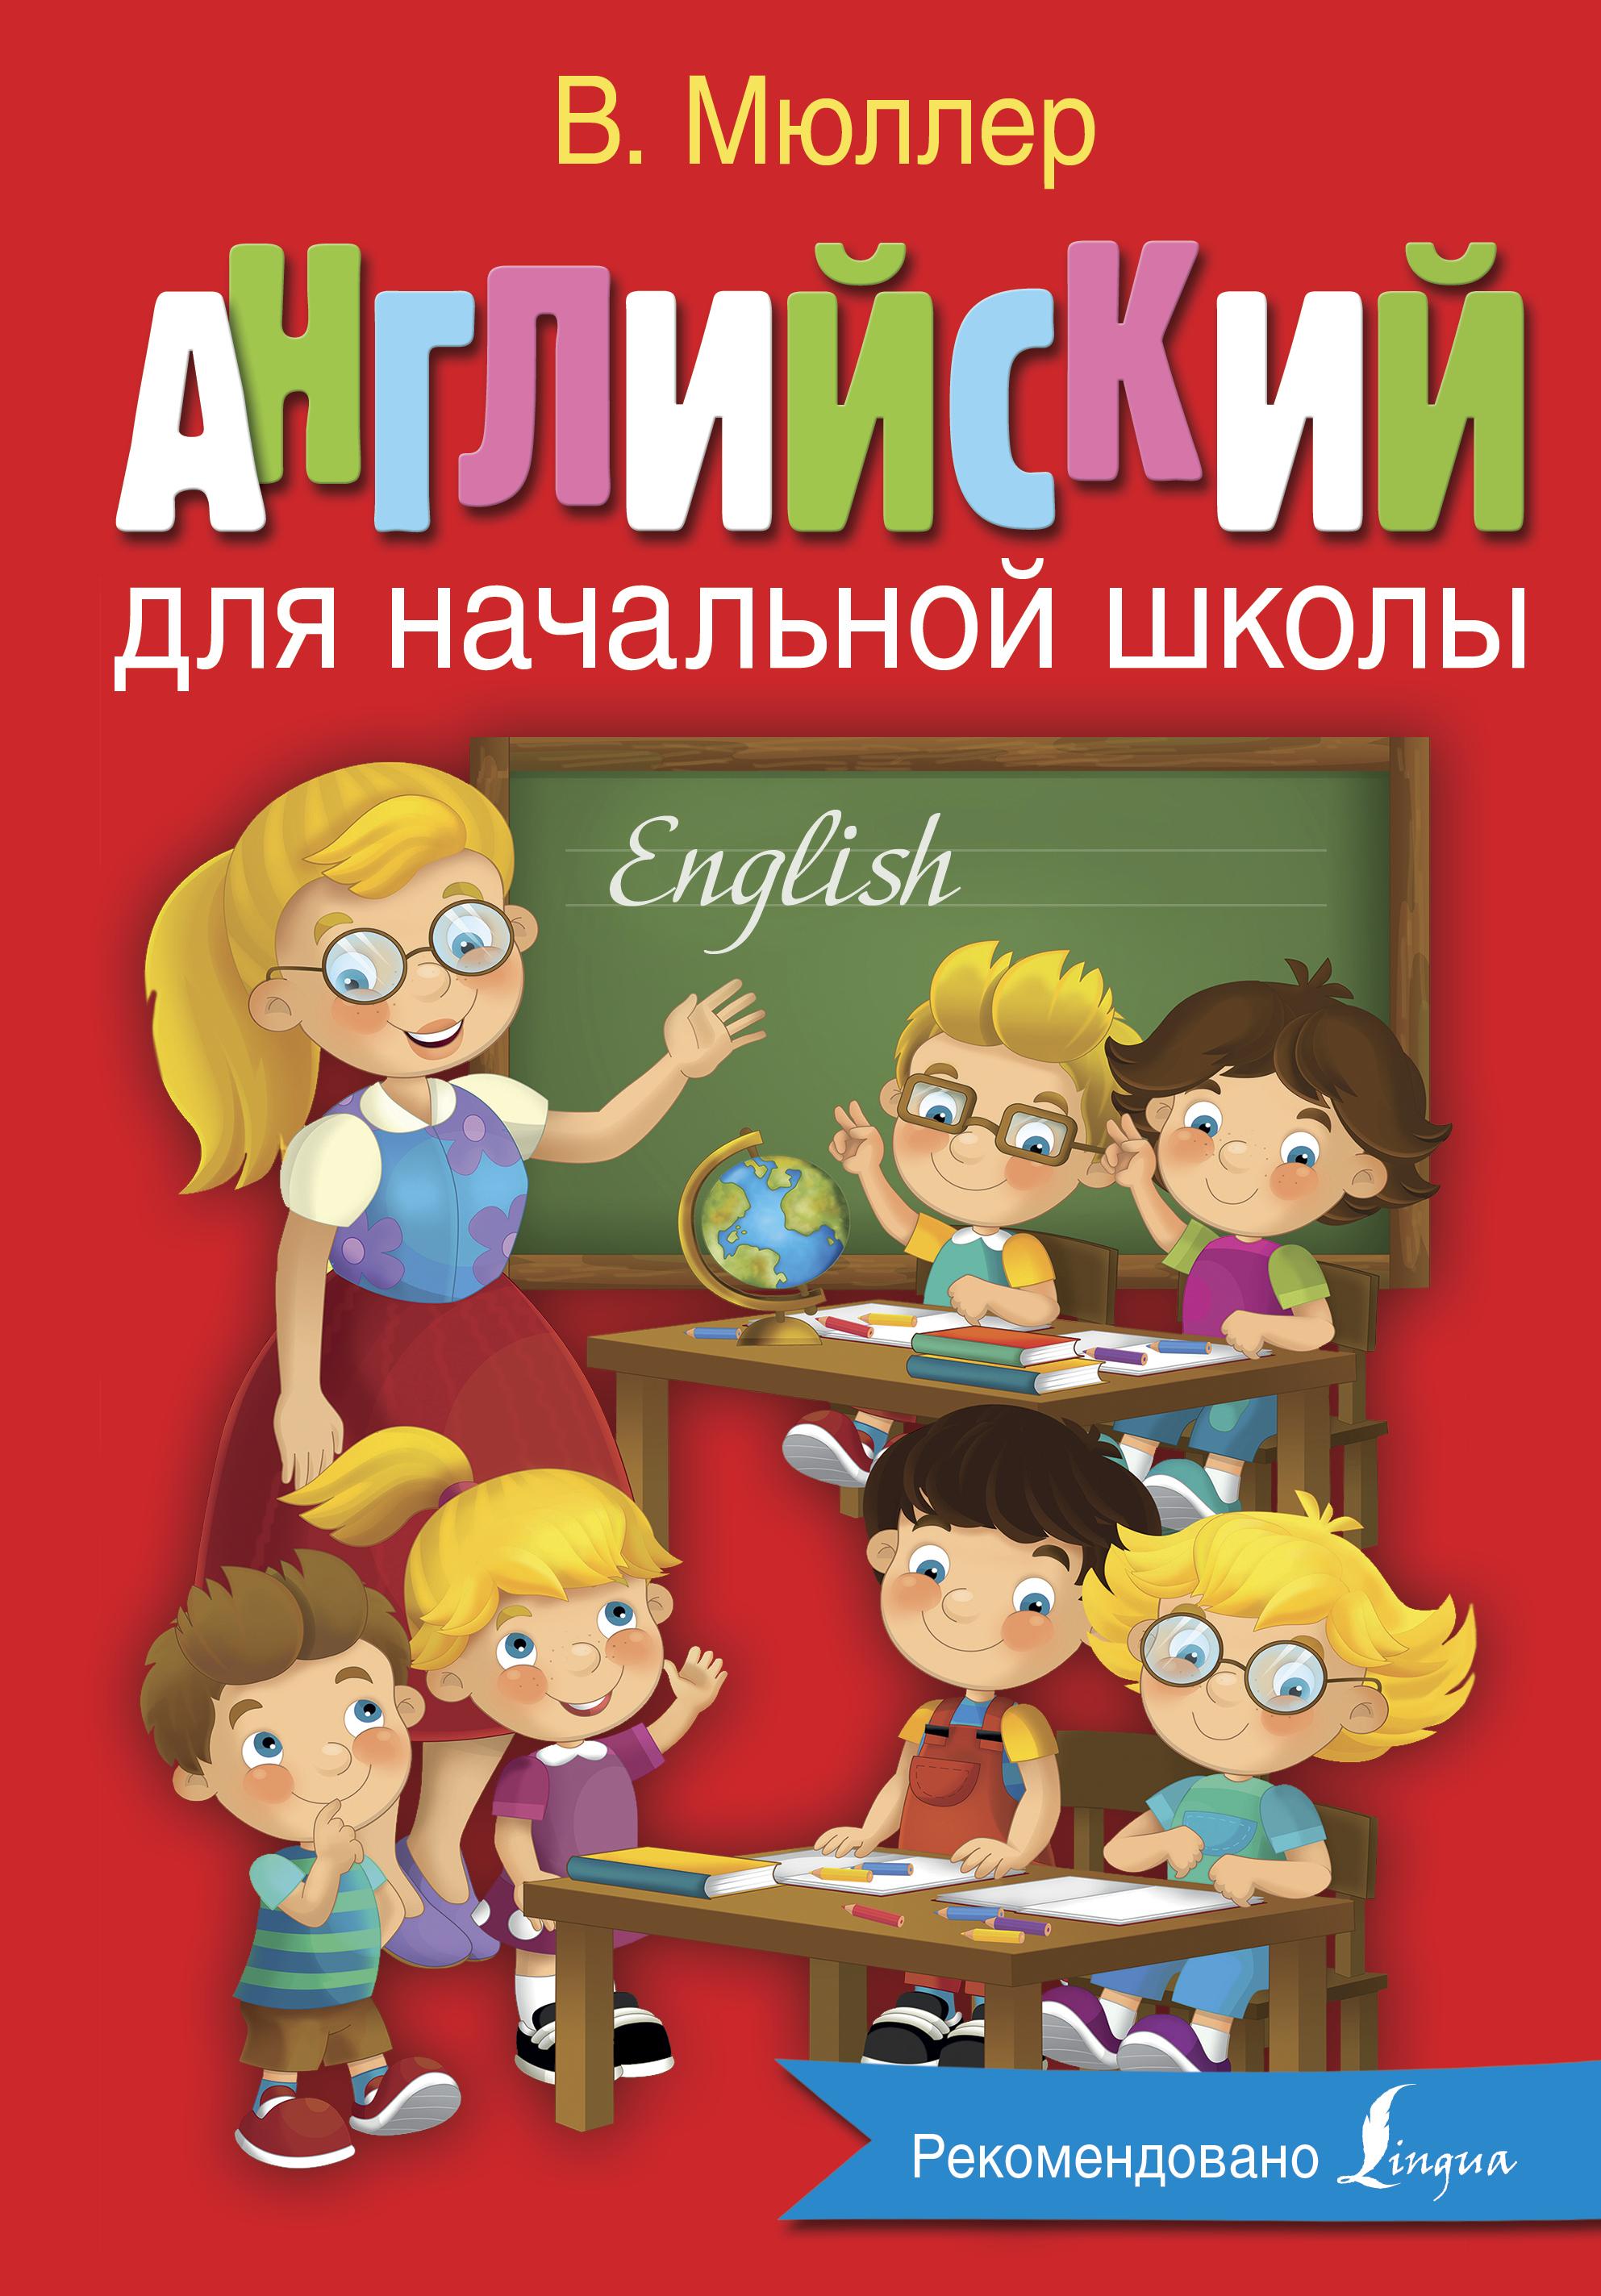 Грамматика английского языка. Grammar in levels elementary – pre-intermediate. Учебное пособие для СПО